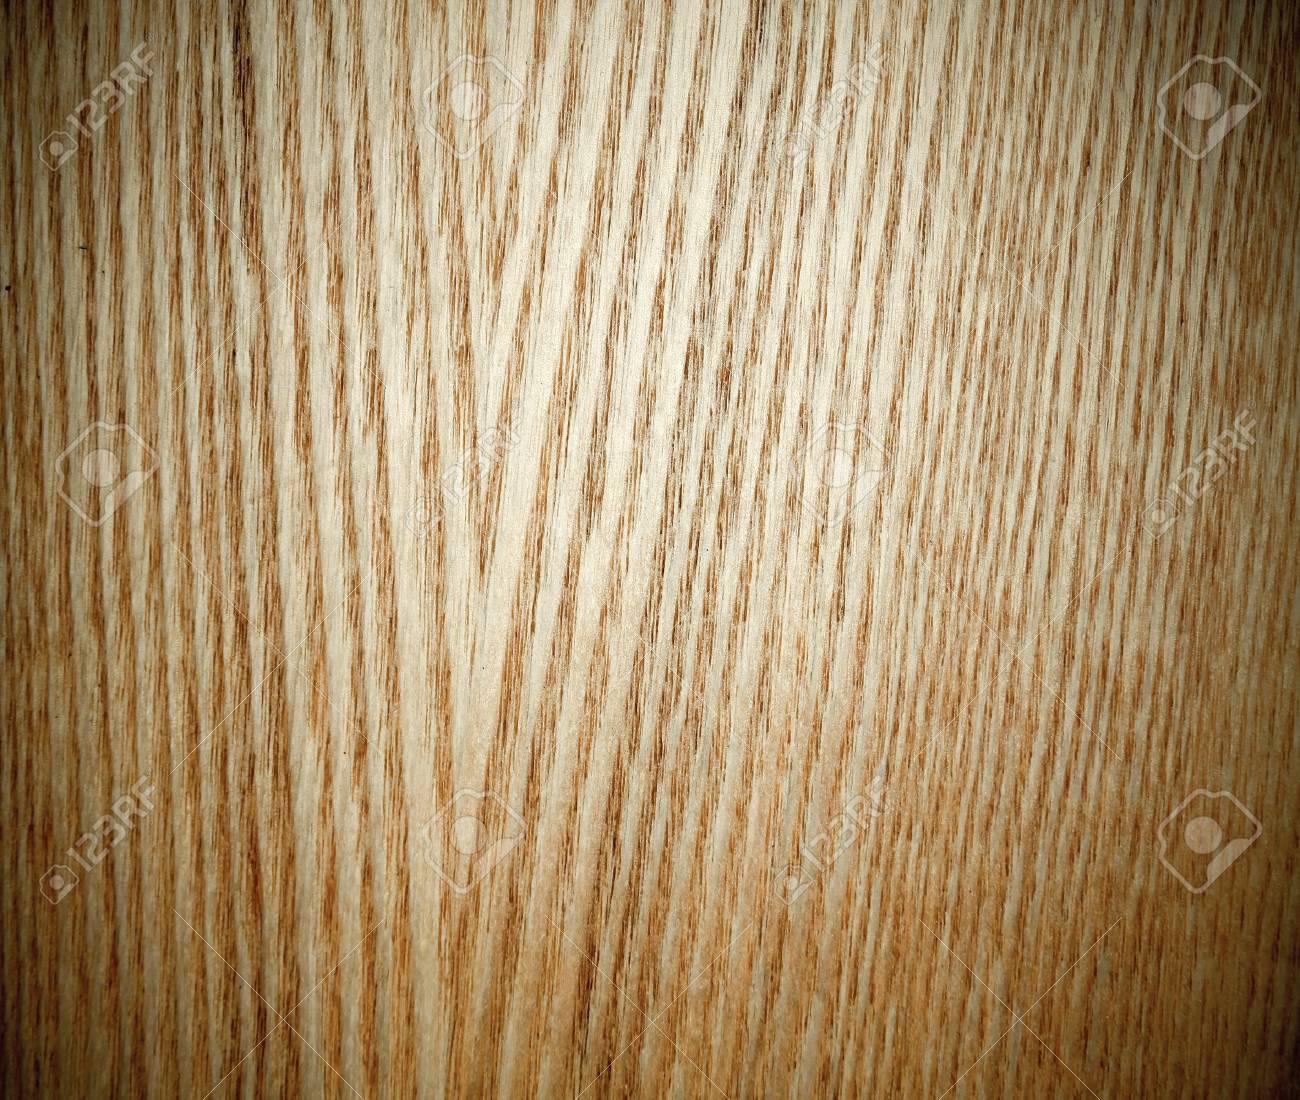 wood texture background Stock Photo - 8103573